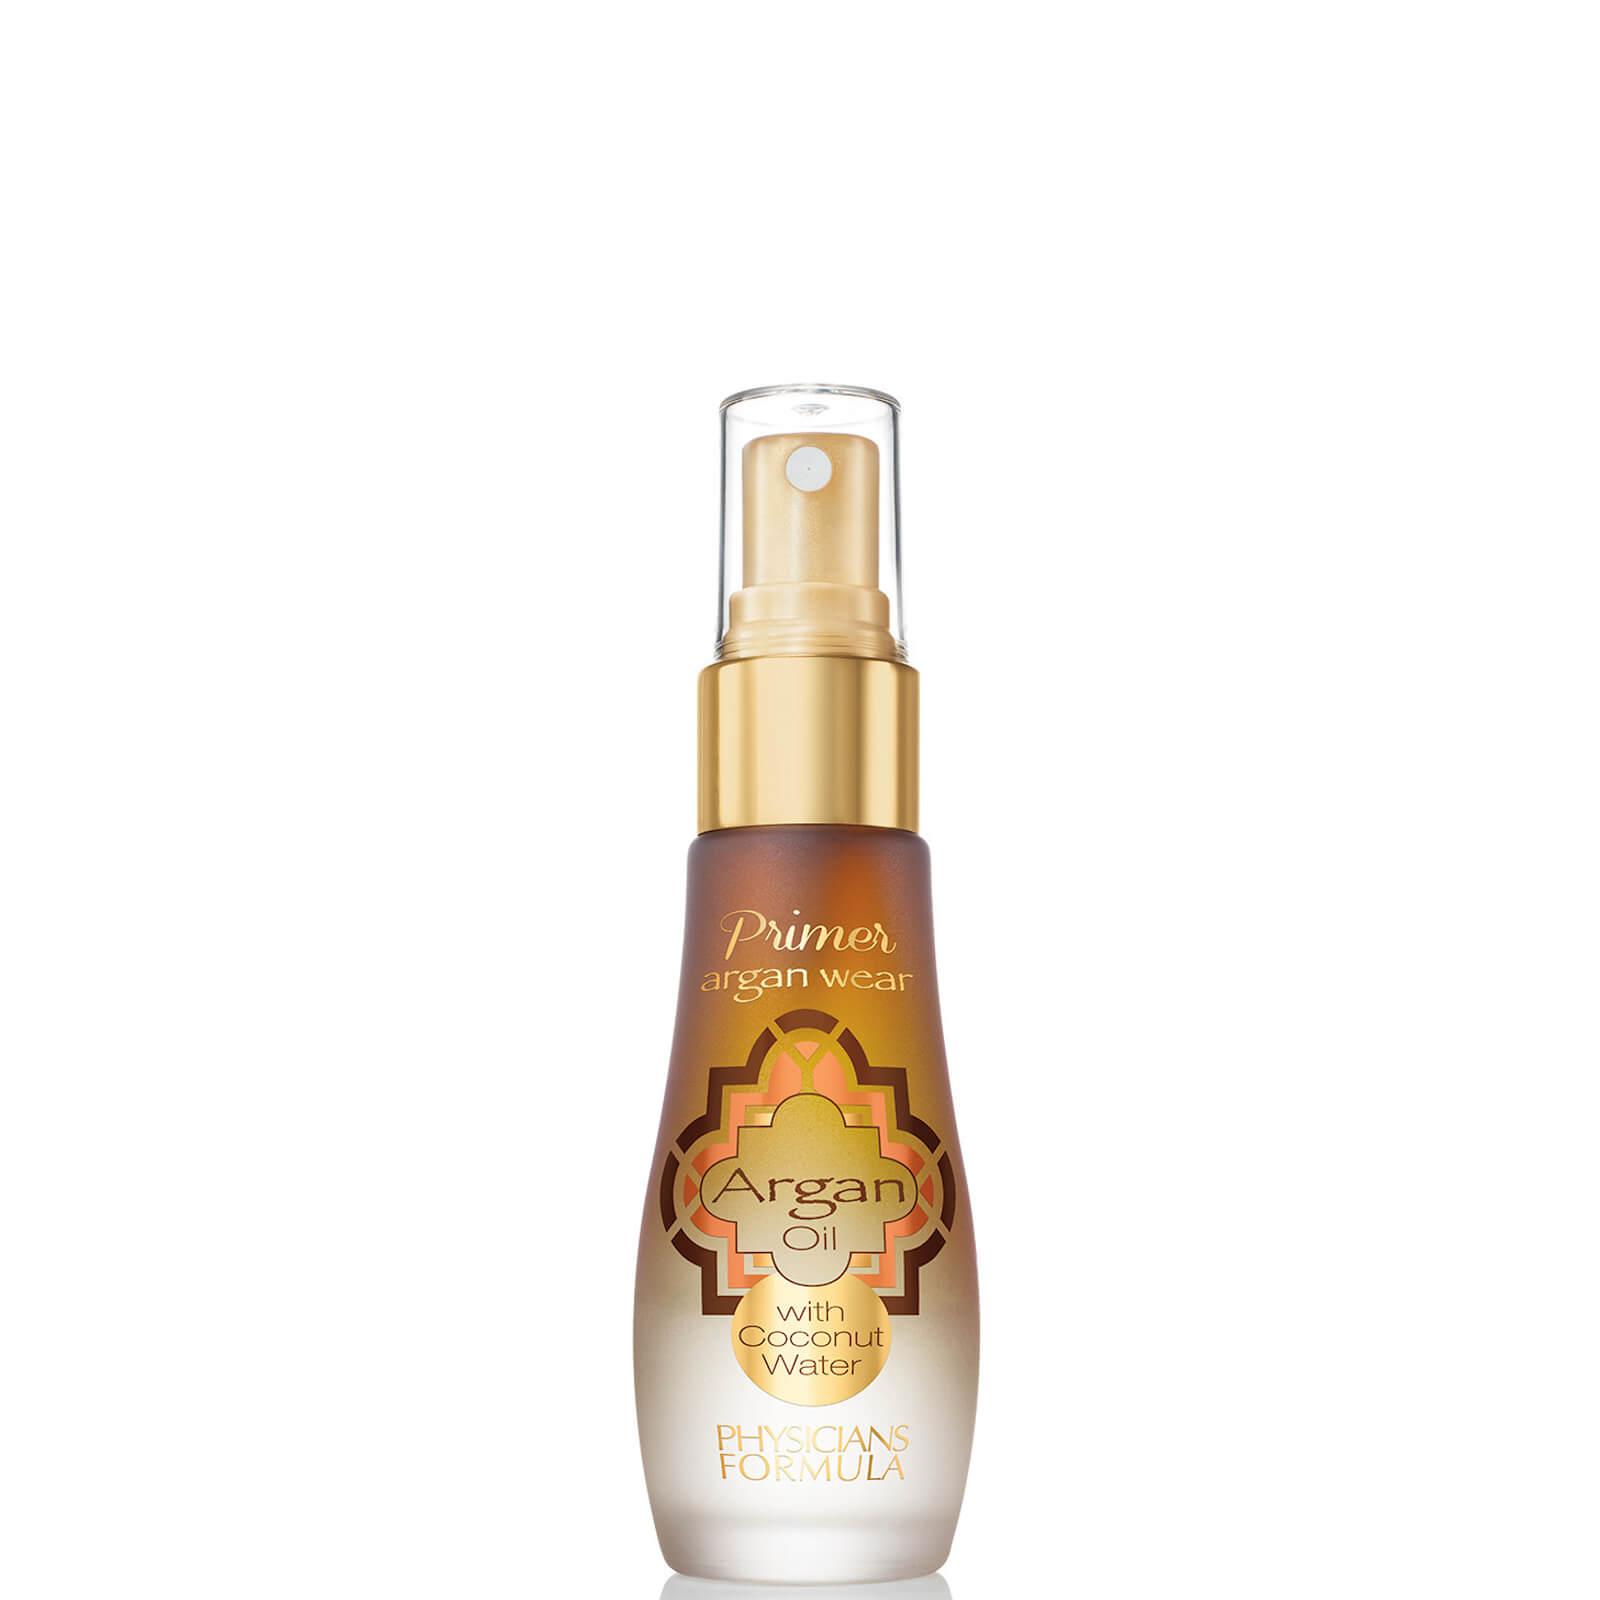 Купить Physicians Formula Argan Wear 2-in-1 Argan Oil & Coconut Water Primer Argan/Coconut Primer